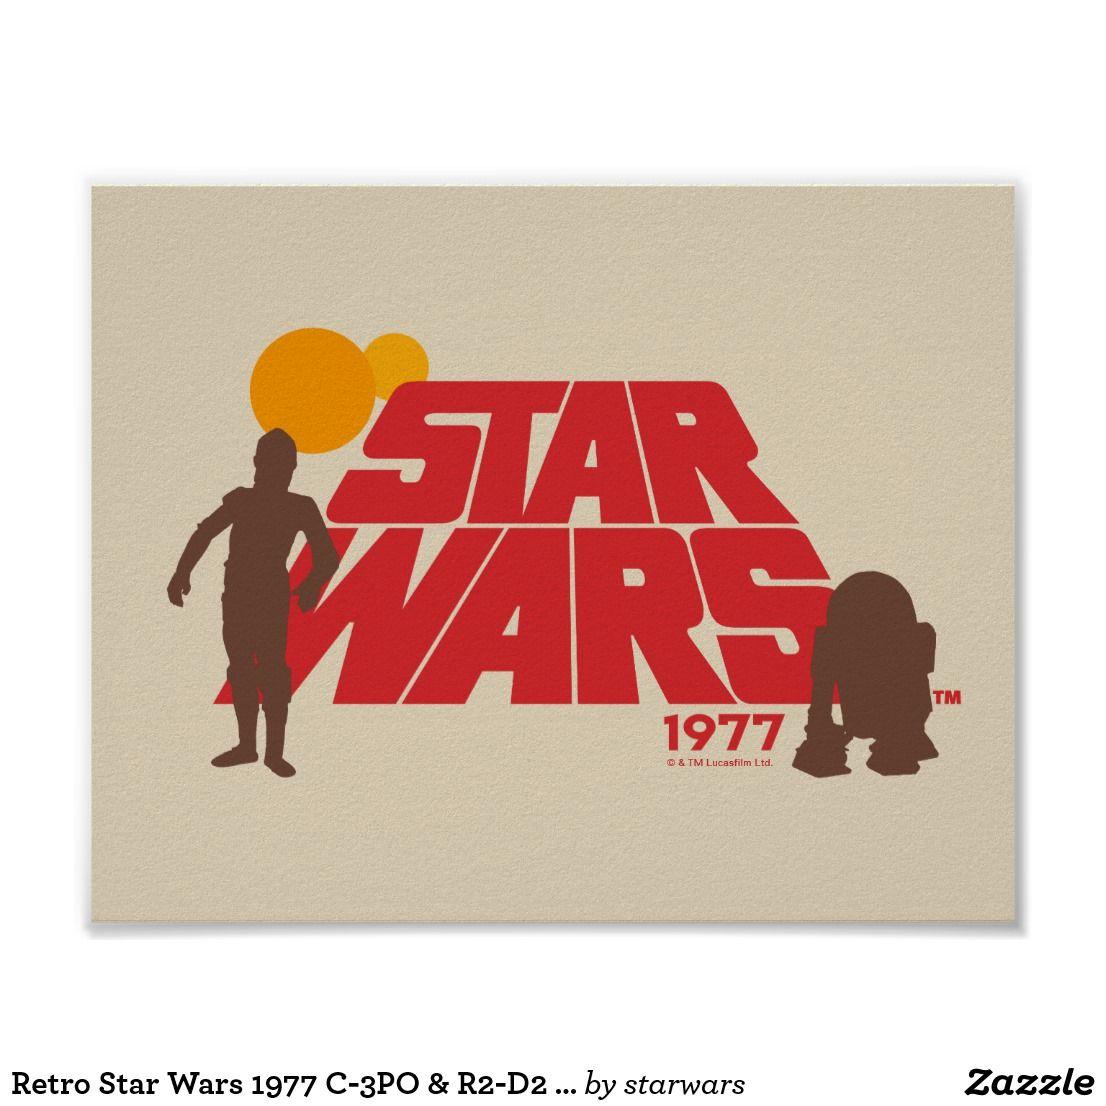 Retro star wars 1977 c3po r2d2 logo poster